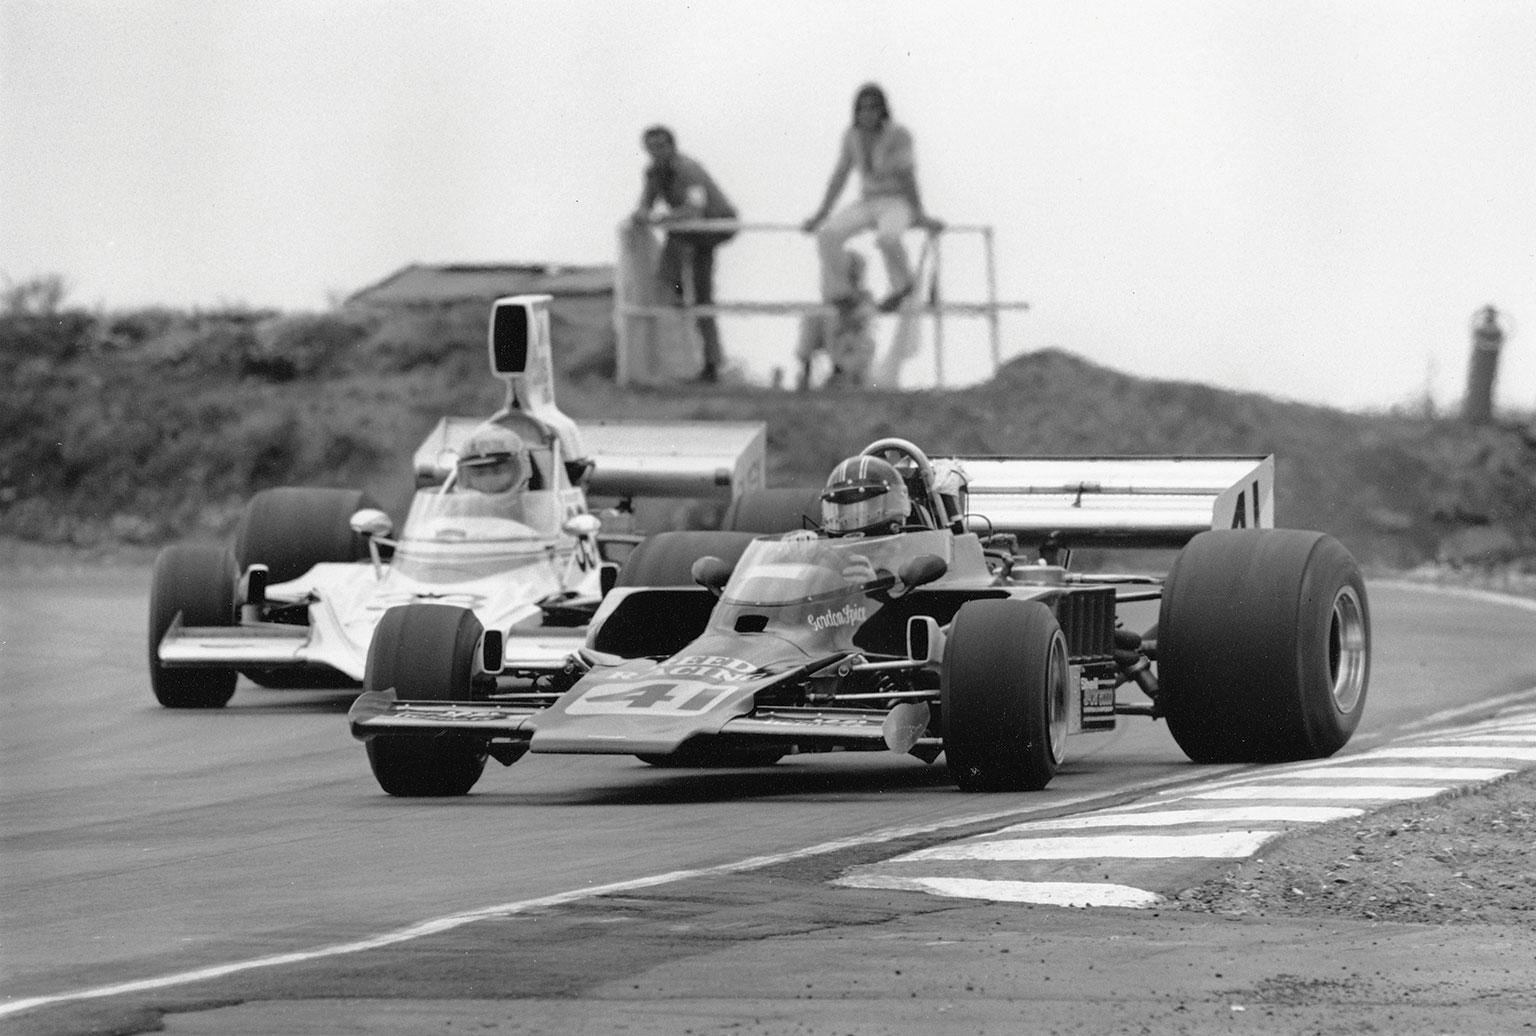 1975-F5000-Snetterton